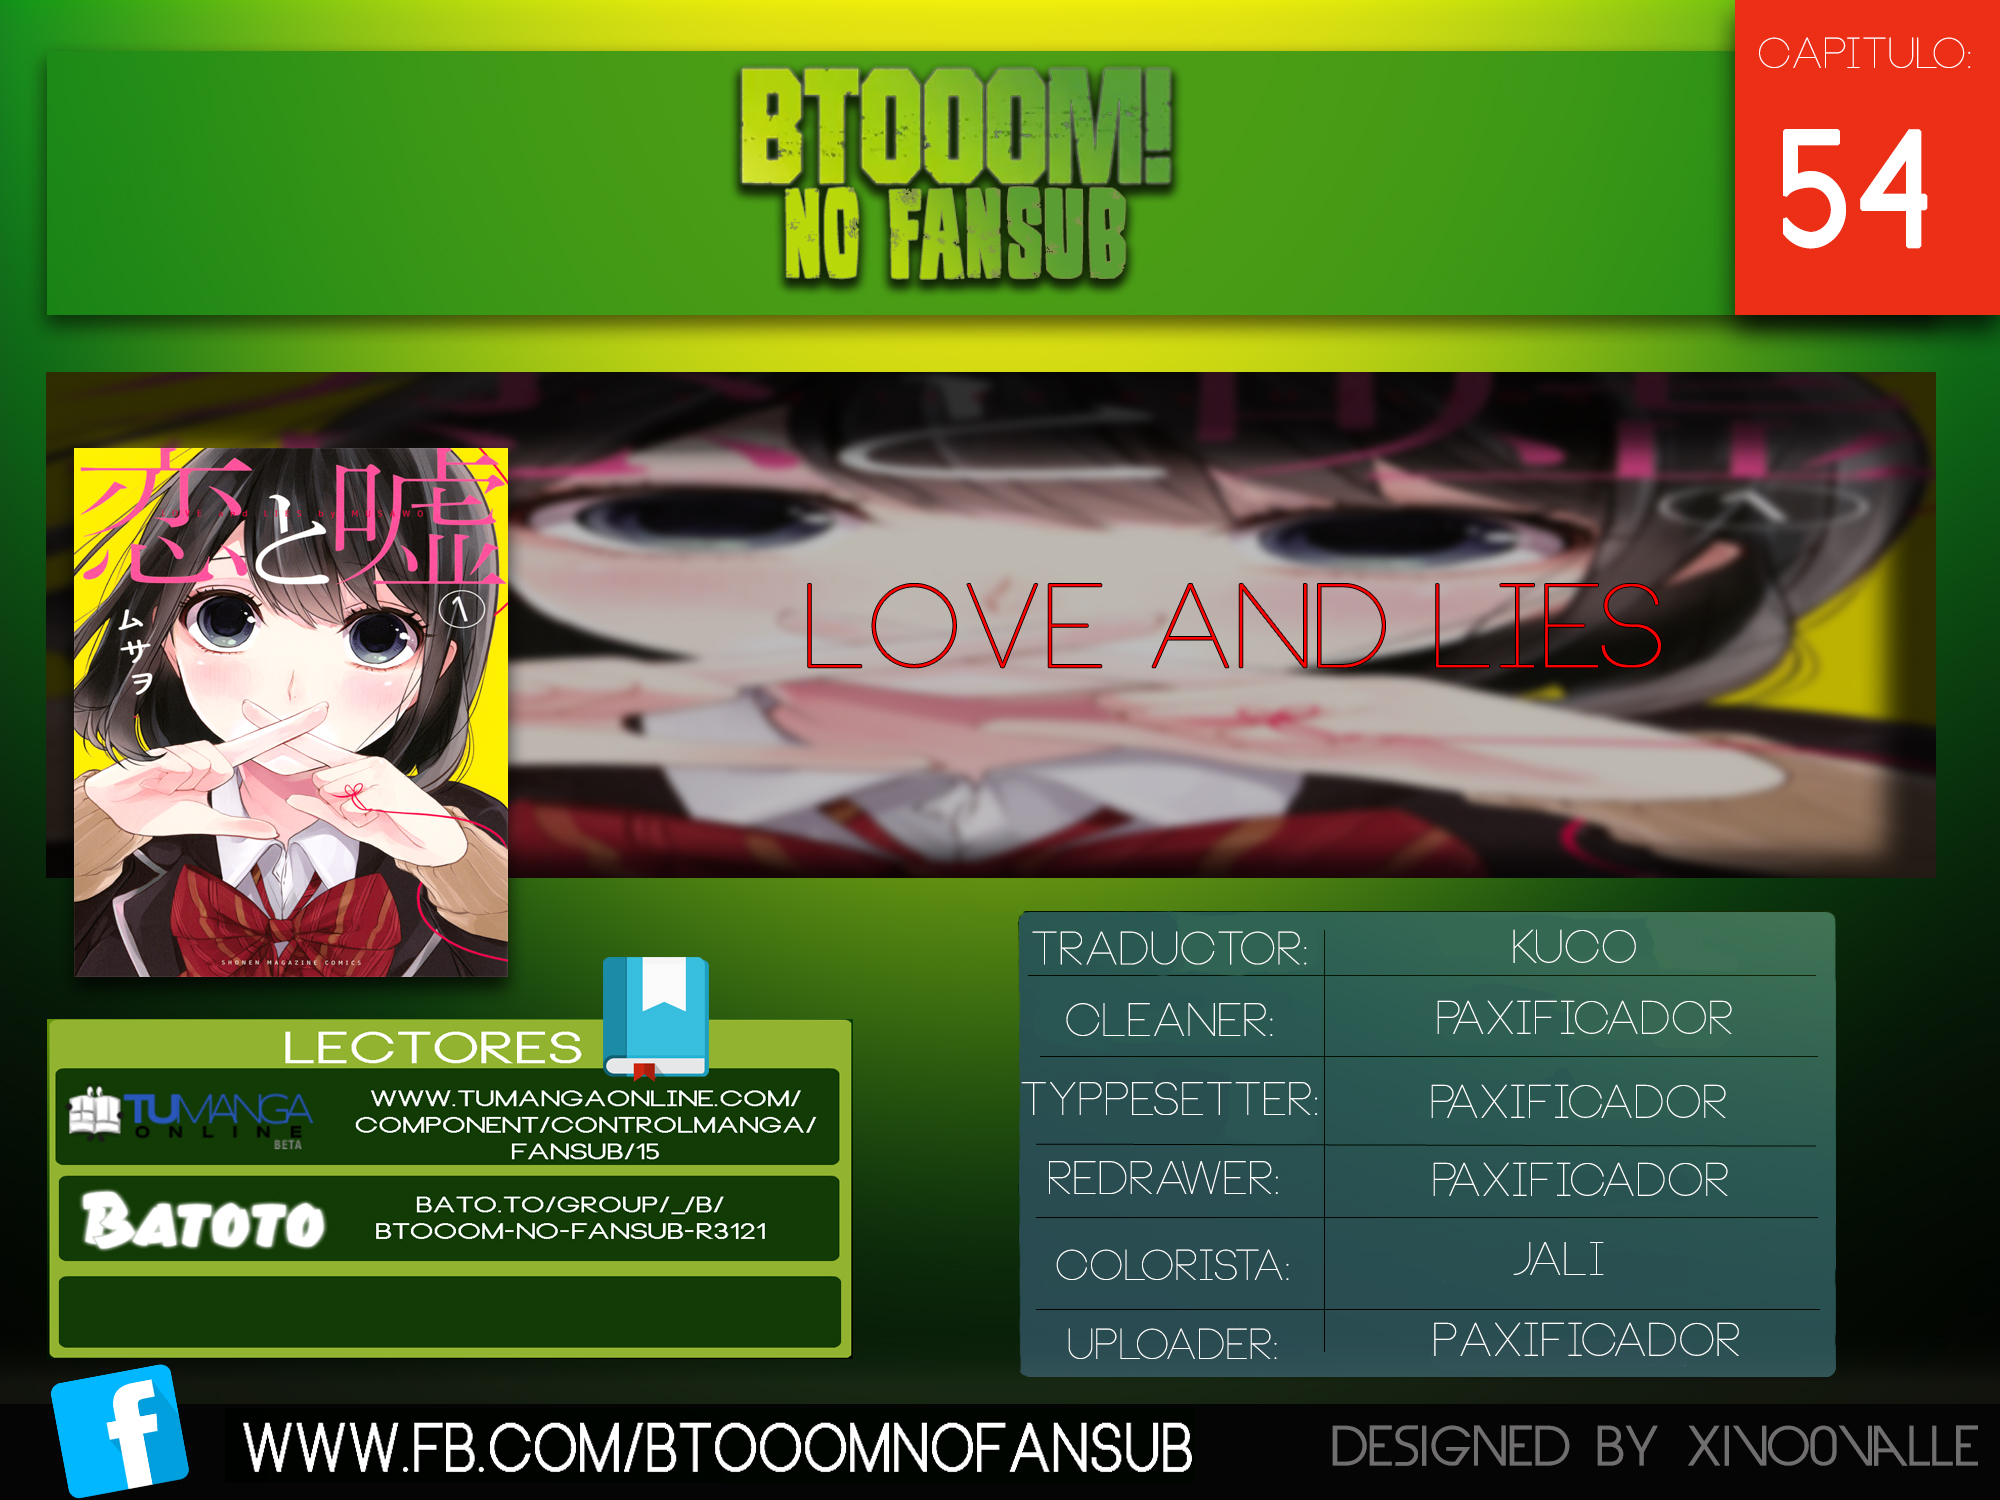 http://c5.ninemanga.com/es_manga/14/14734/416556/db7153cd33dfe7c9d20694adabfd339c.jpg Page 1